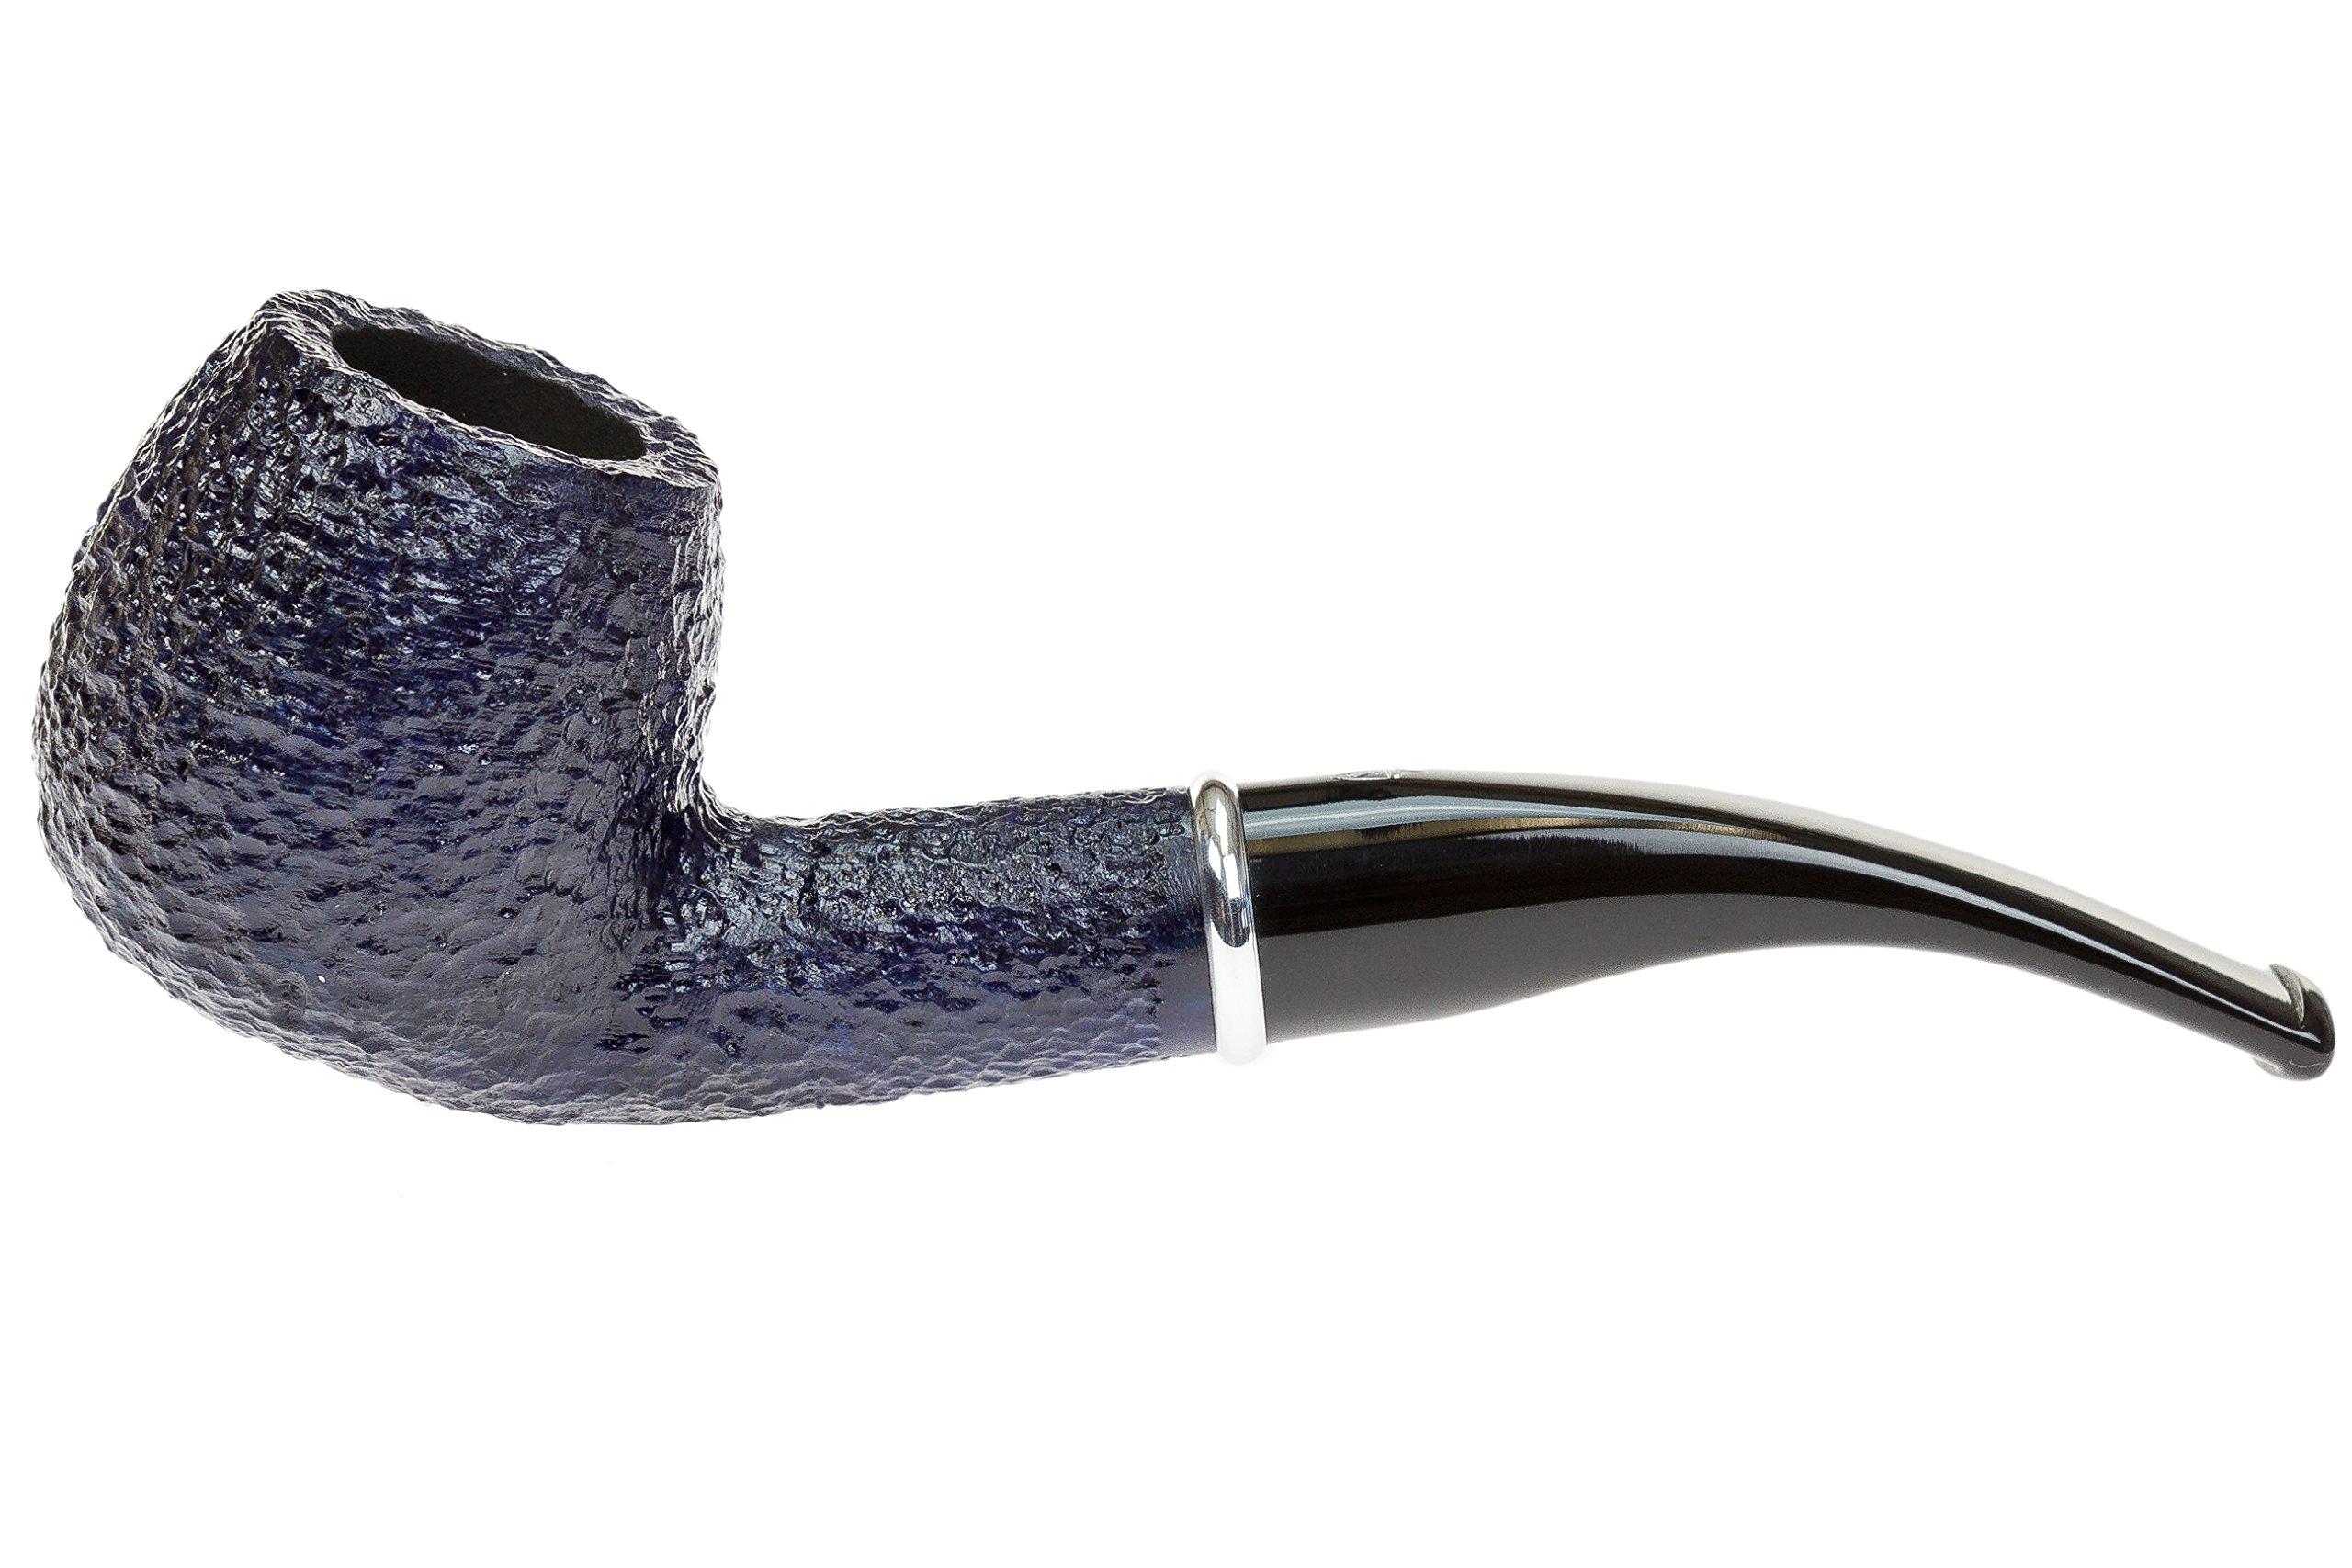 Savinelli Arcobaleno 626 Blue Tobacco Pipe - Rustic by Savinelli